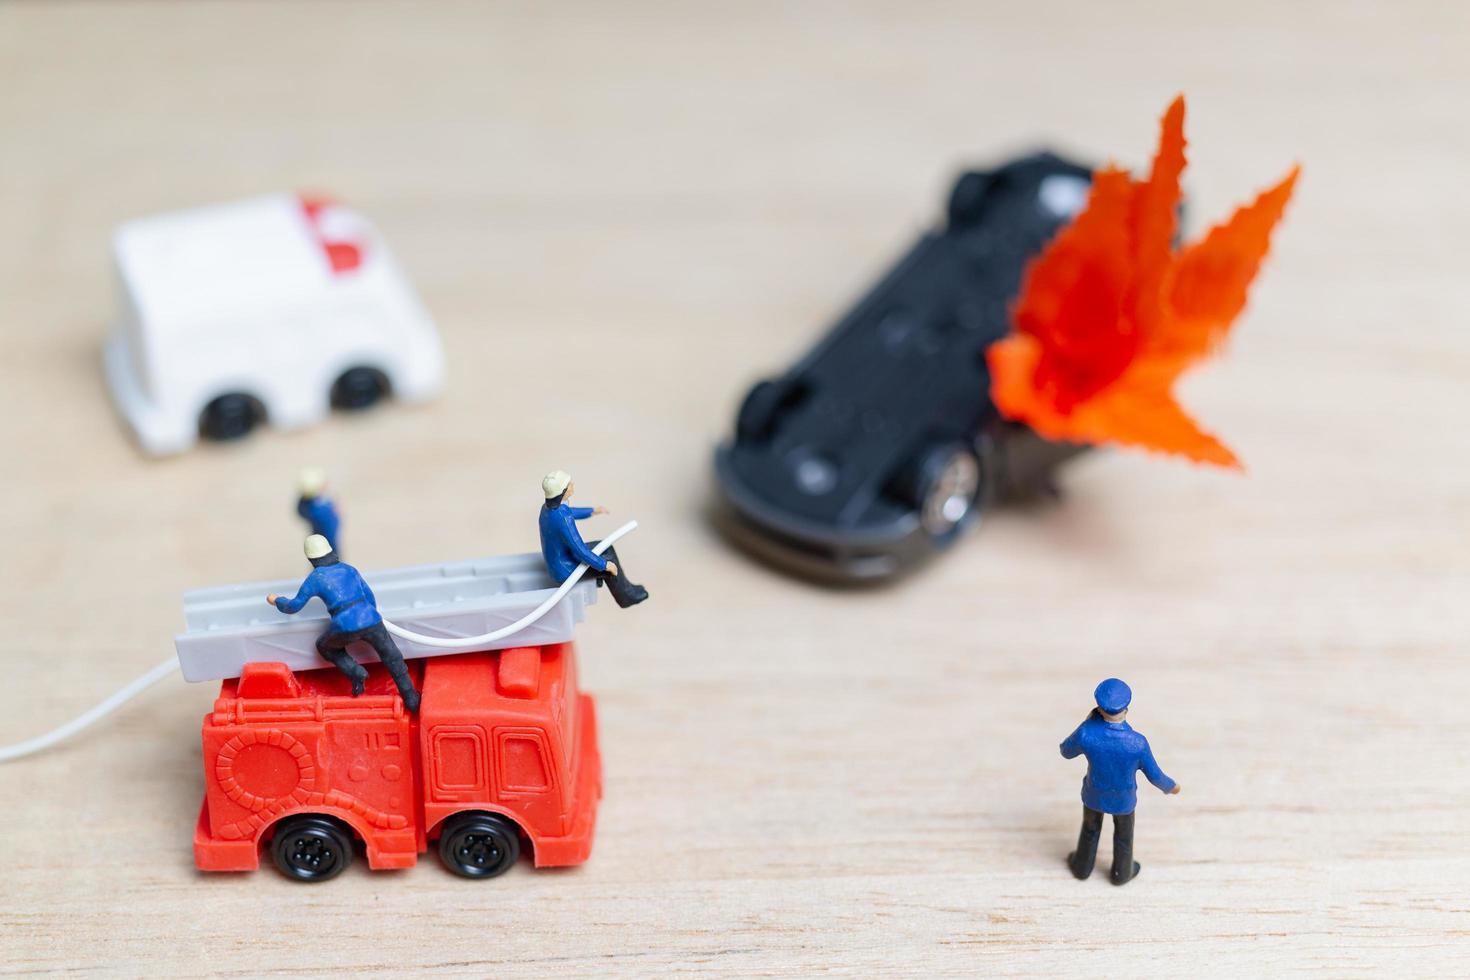 Miniatur Feuerwehrleute bei einem Autounfall, Autounfallkonzept foto